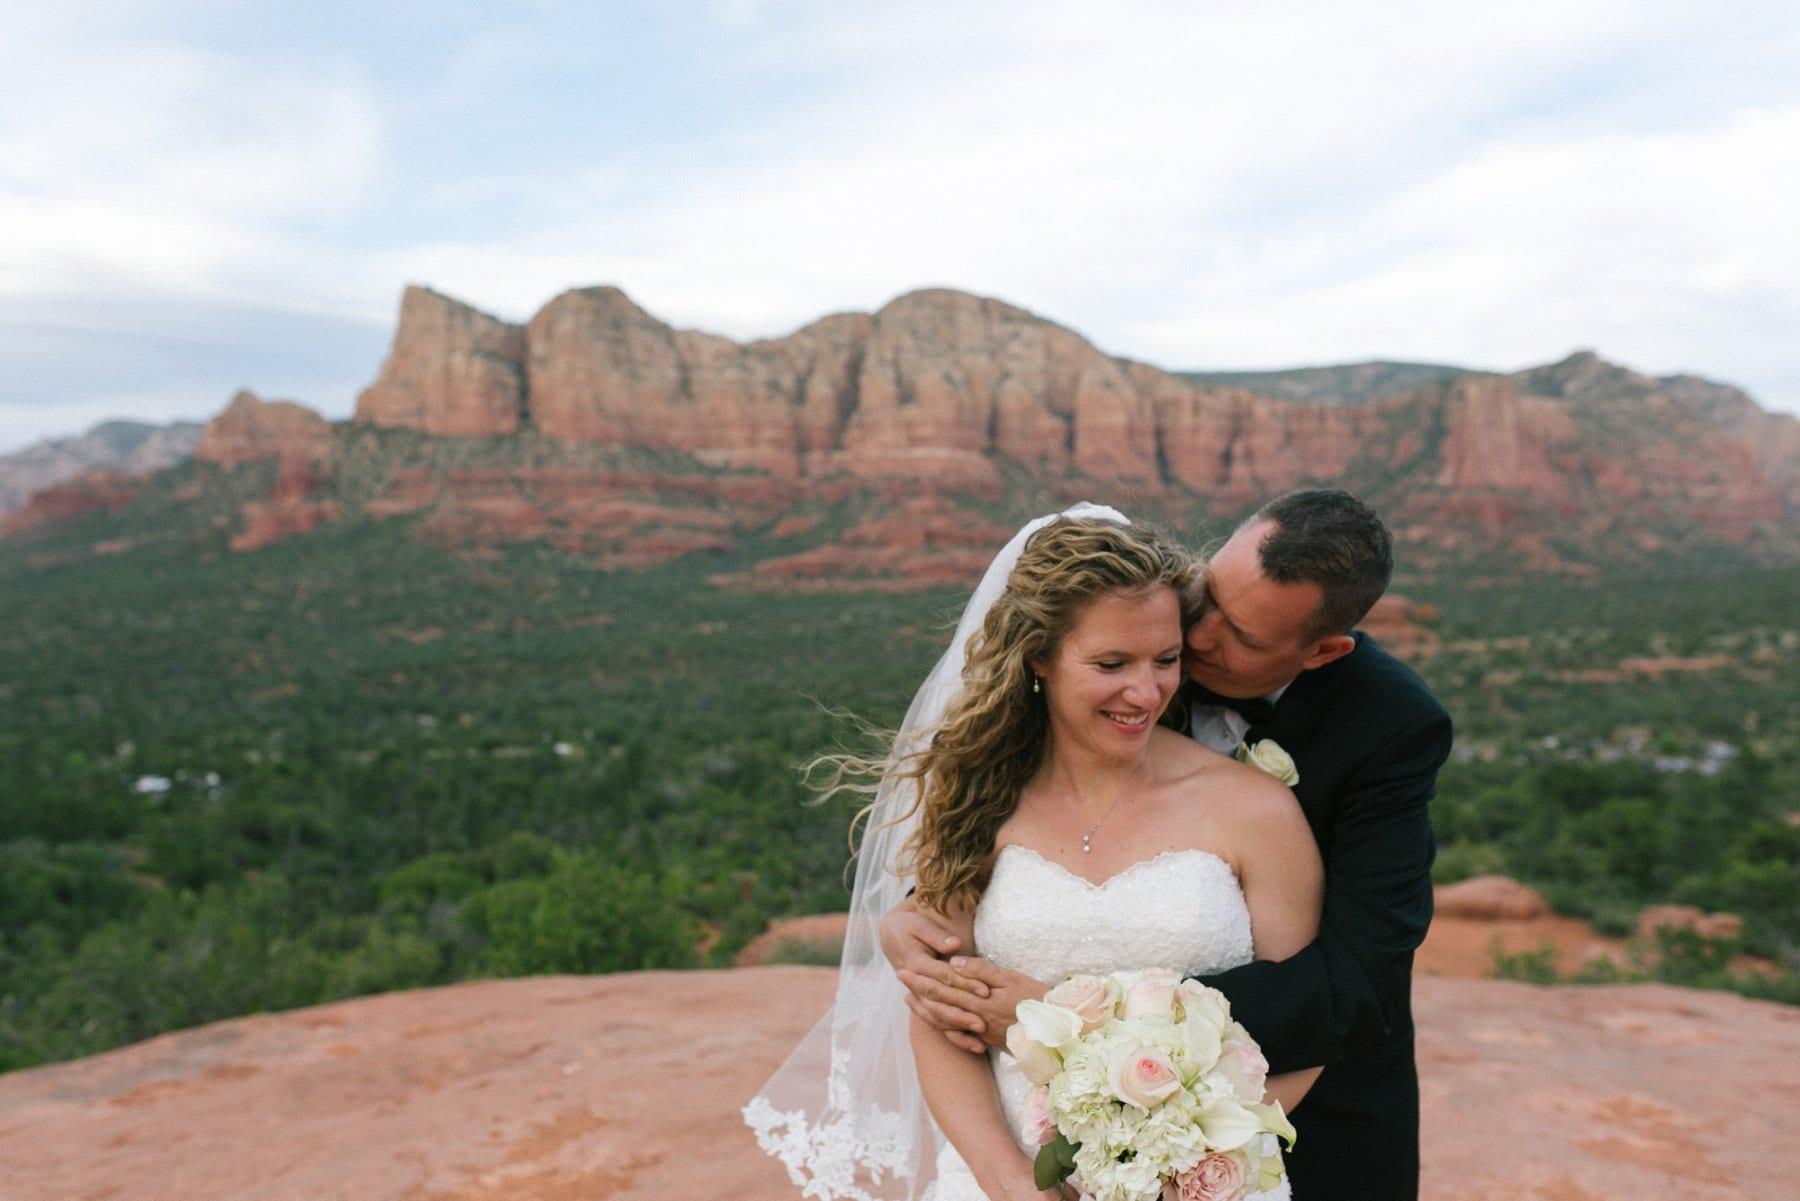 bride & groom at Sedona Yavapai Lookout Trail